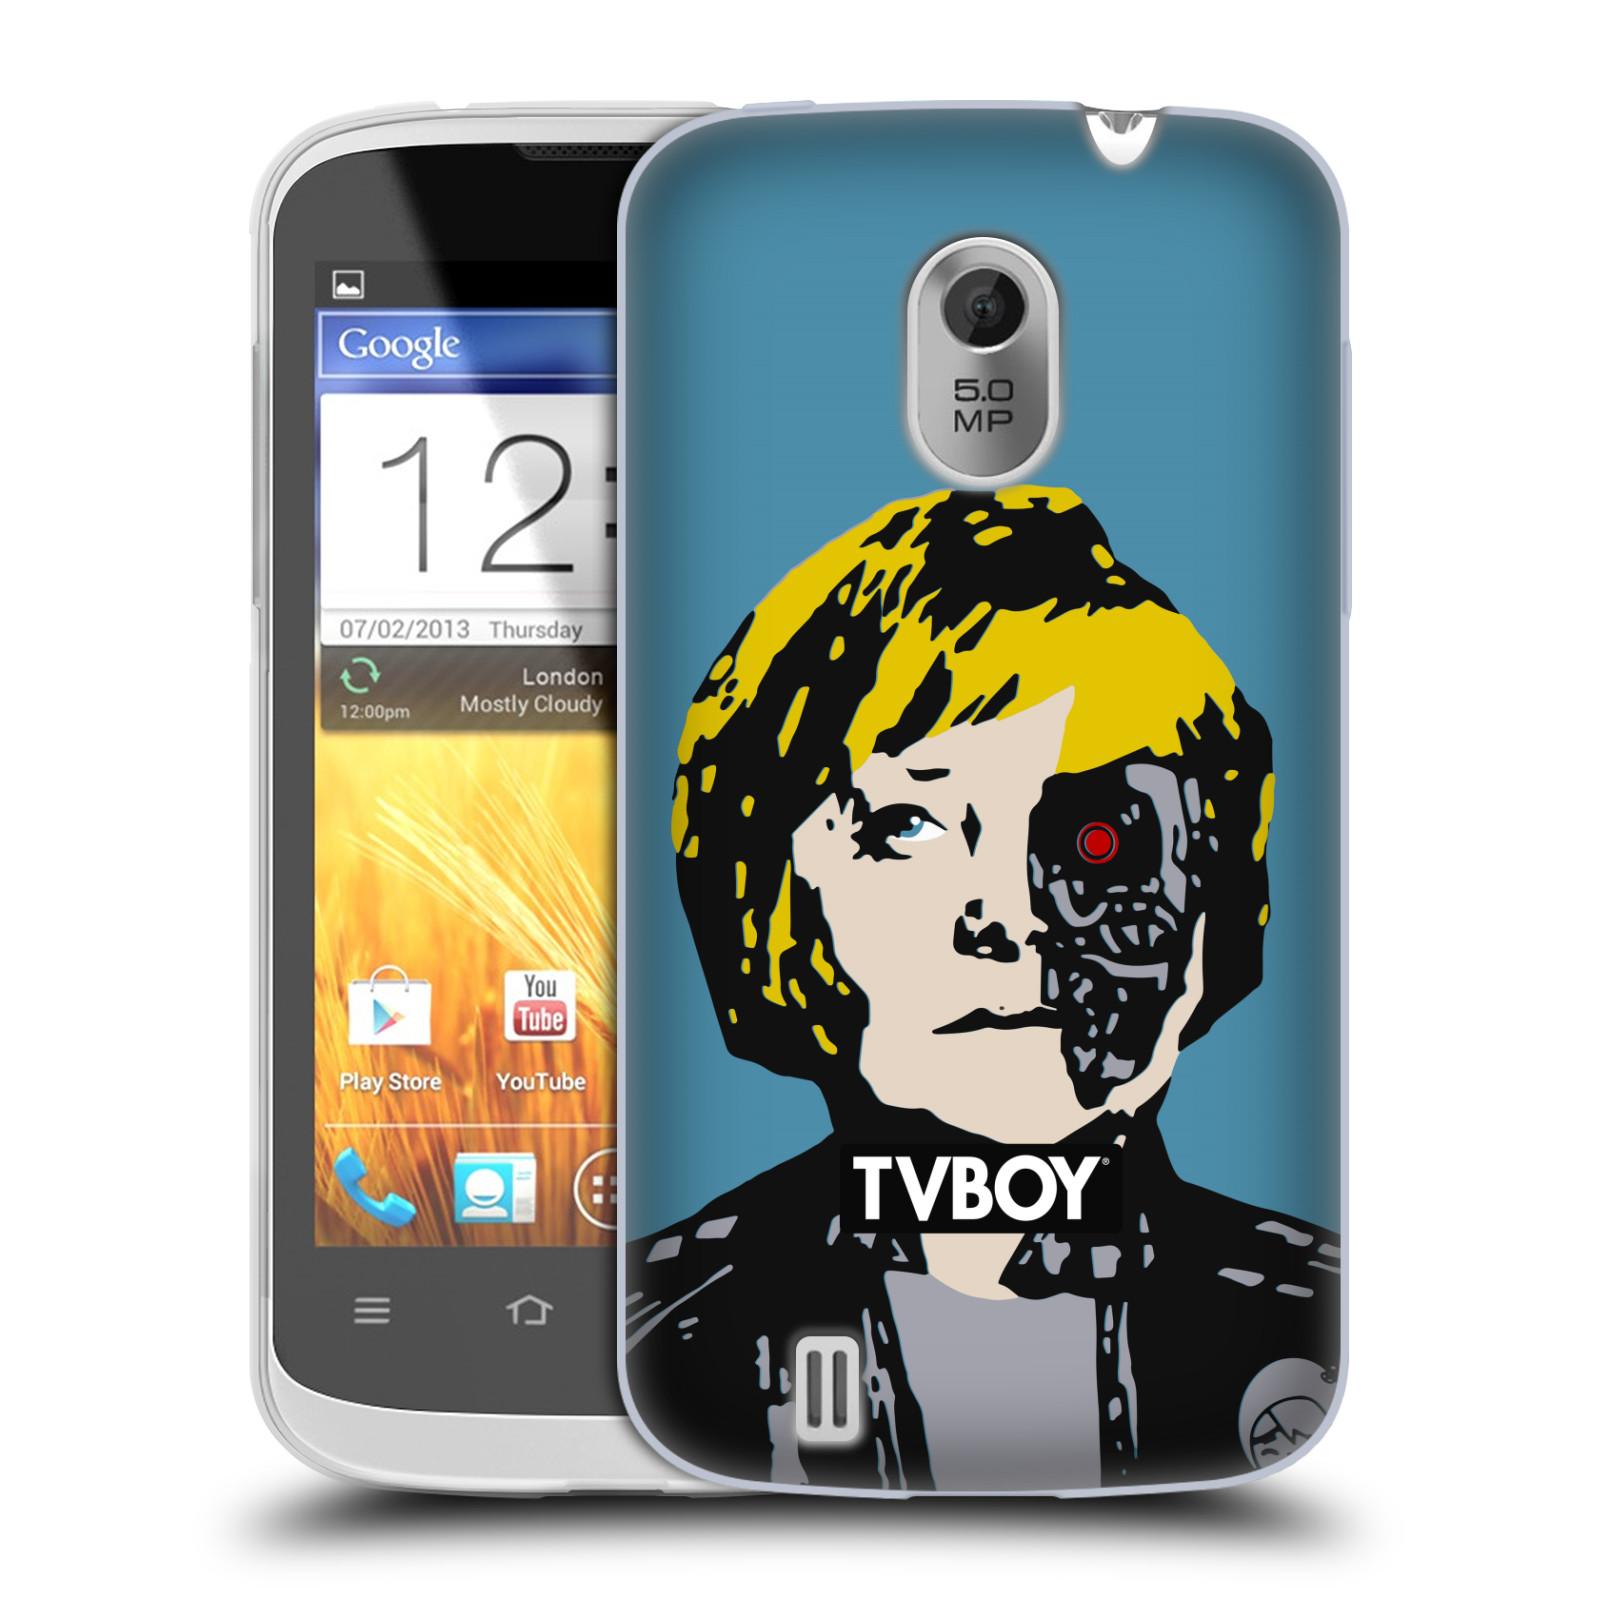 Silikonové pouzdro na mobil ZTE Blade III HEAD CASE - TVBOY - Merkenator - Angela Merkelová (Silikonový kryt či obal na mobilní telefon s licencovaným motivem TVBOY pro ZTE Blade 3)